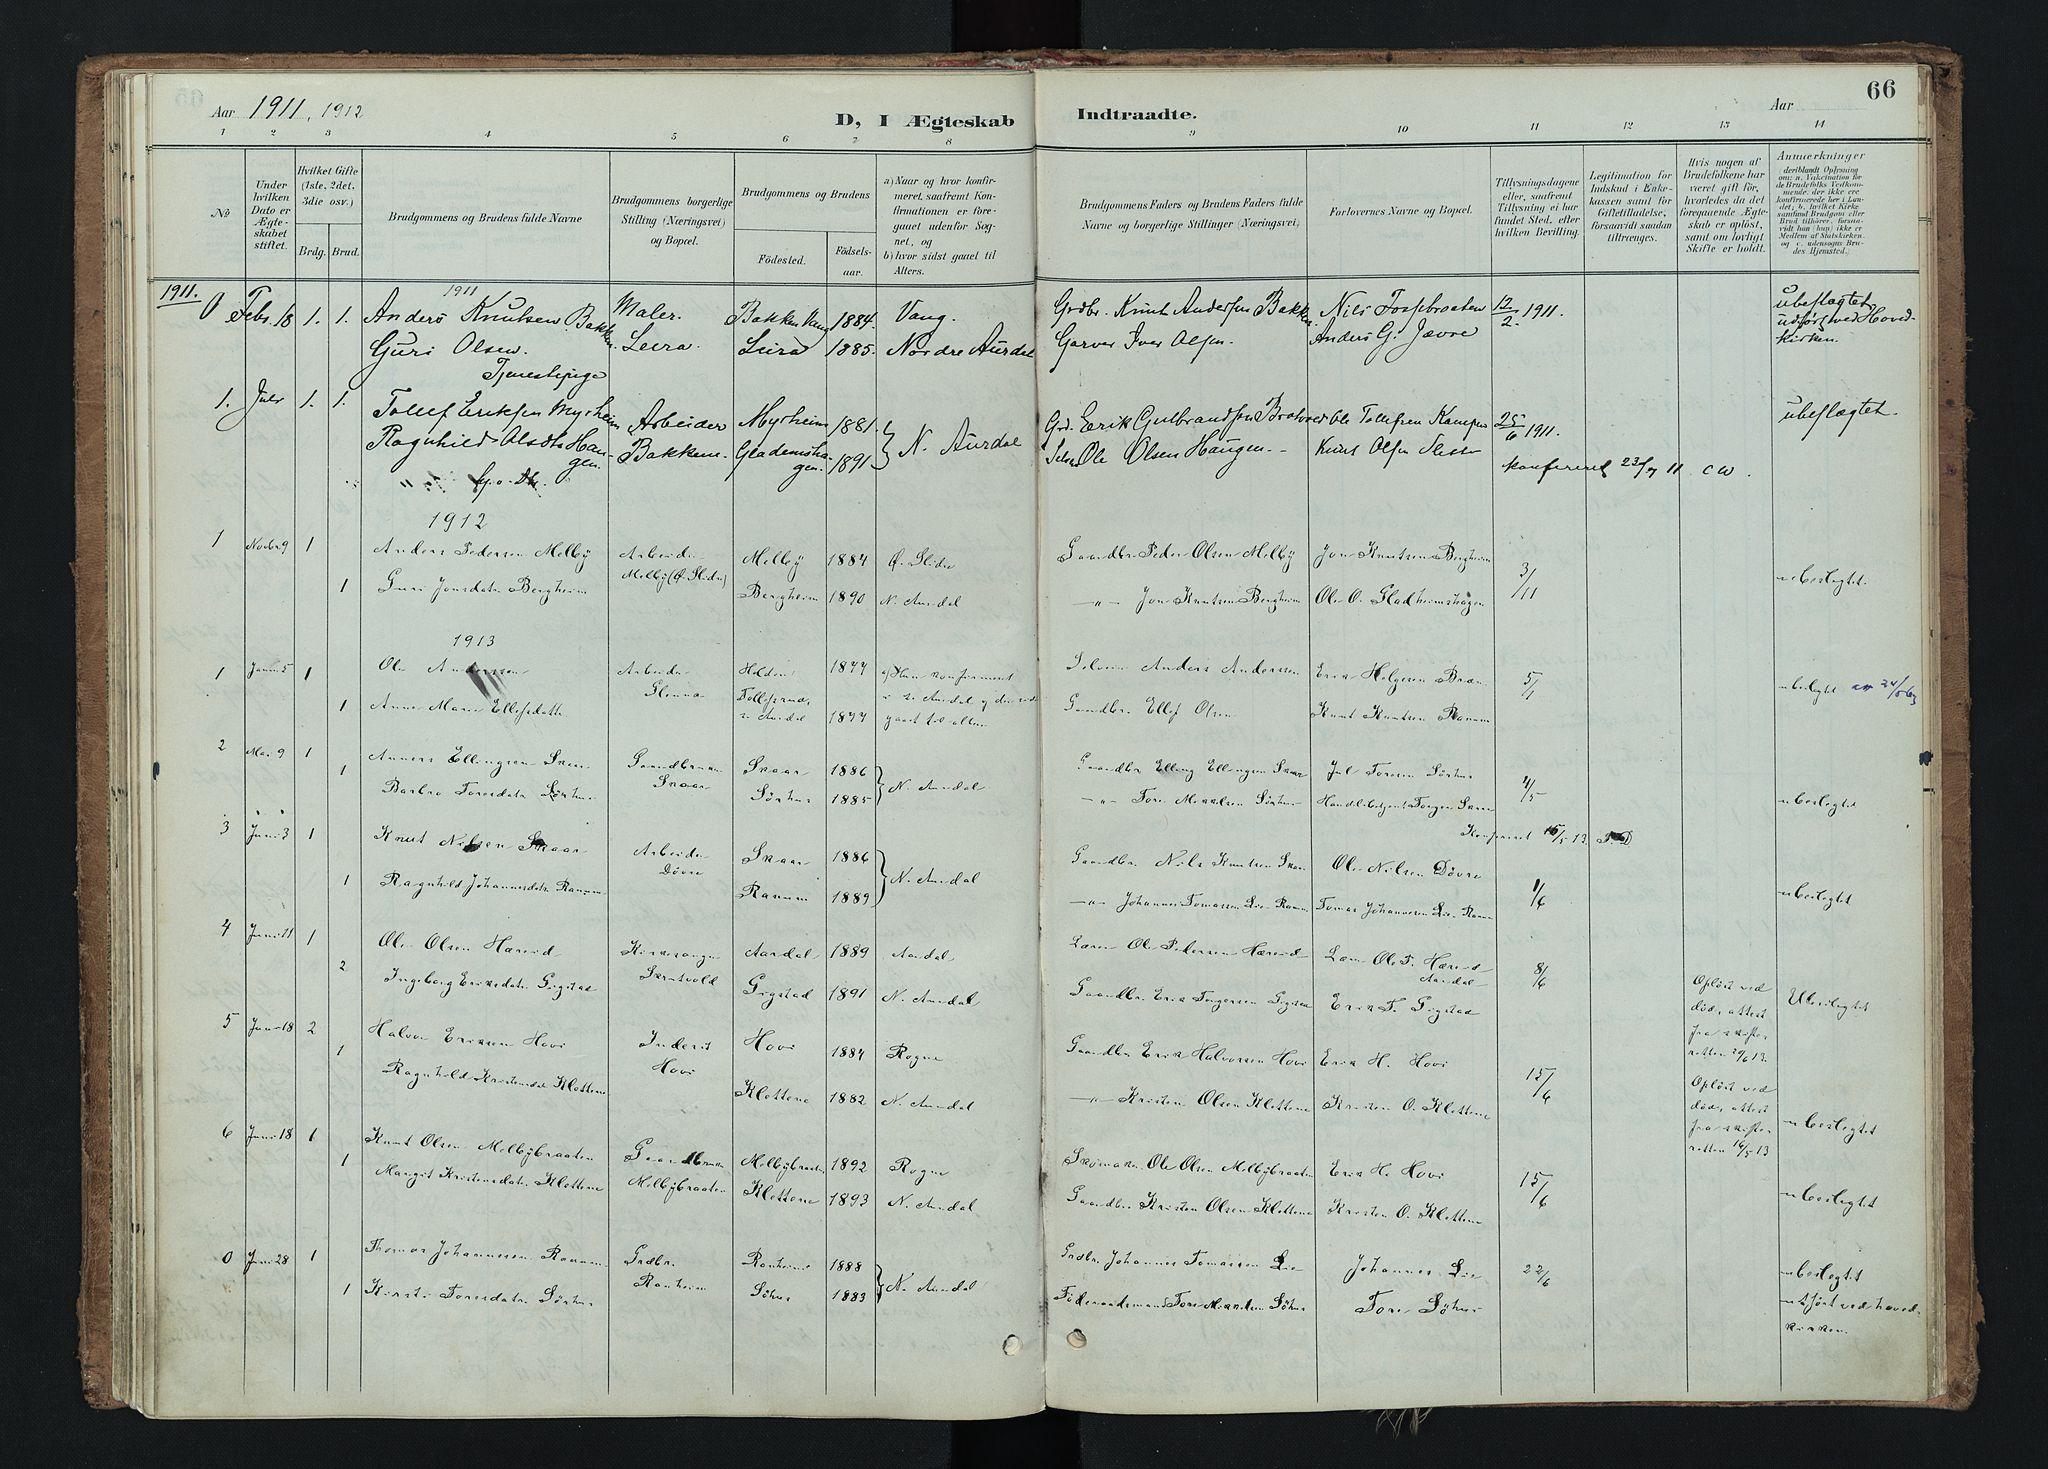 SAH, Nord-Aurdal prestekontor, Ministerialbok nr. 15, 1896-1914, s. 66